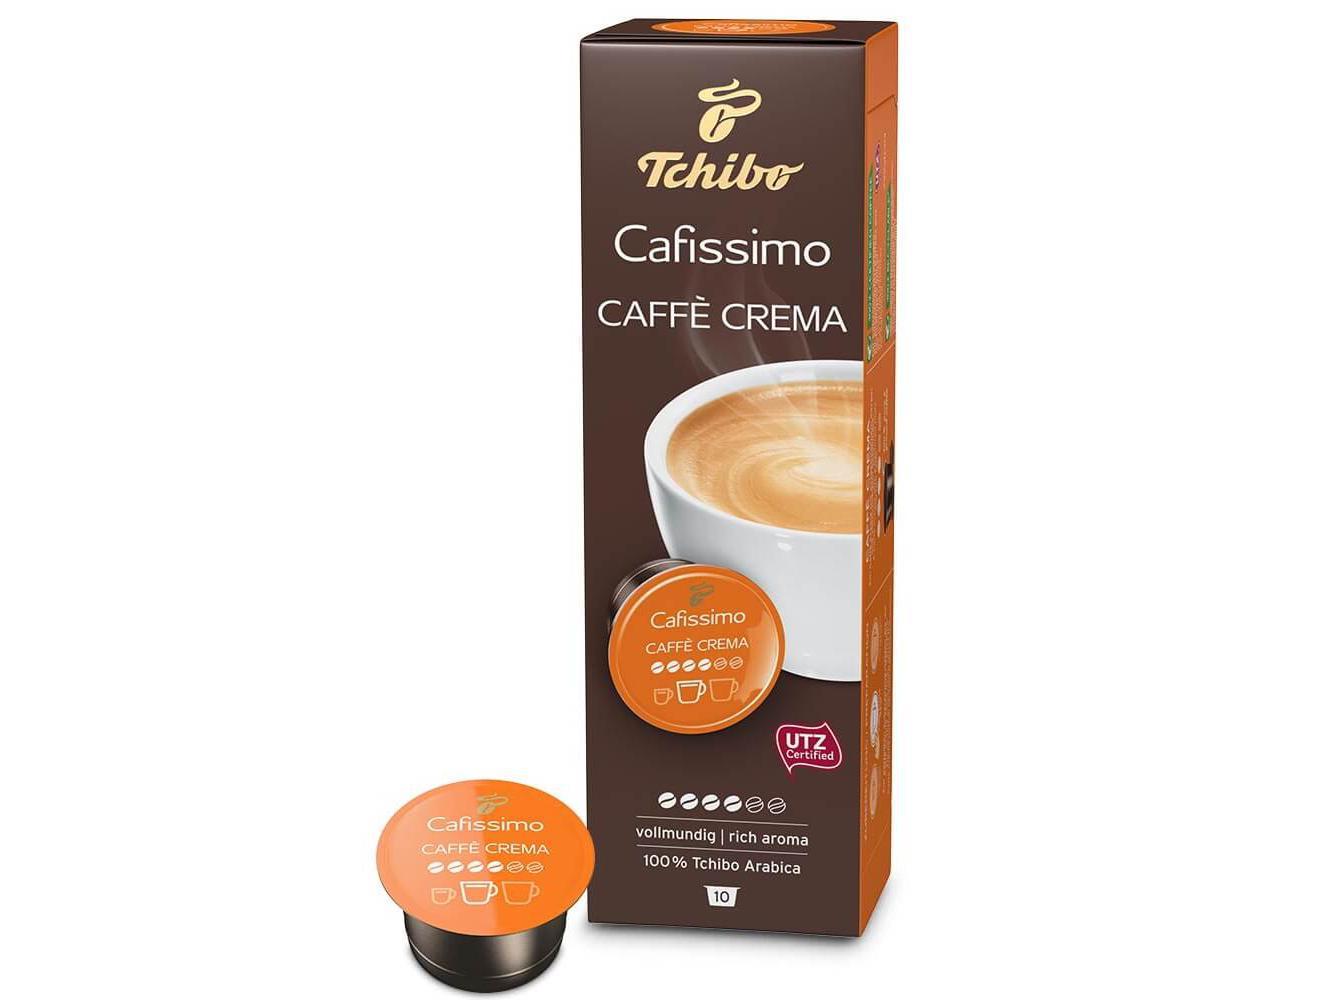 Tchibo Cafissimo Caffe Crema Rich aroma